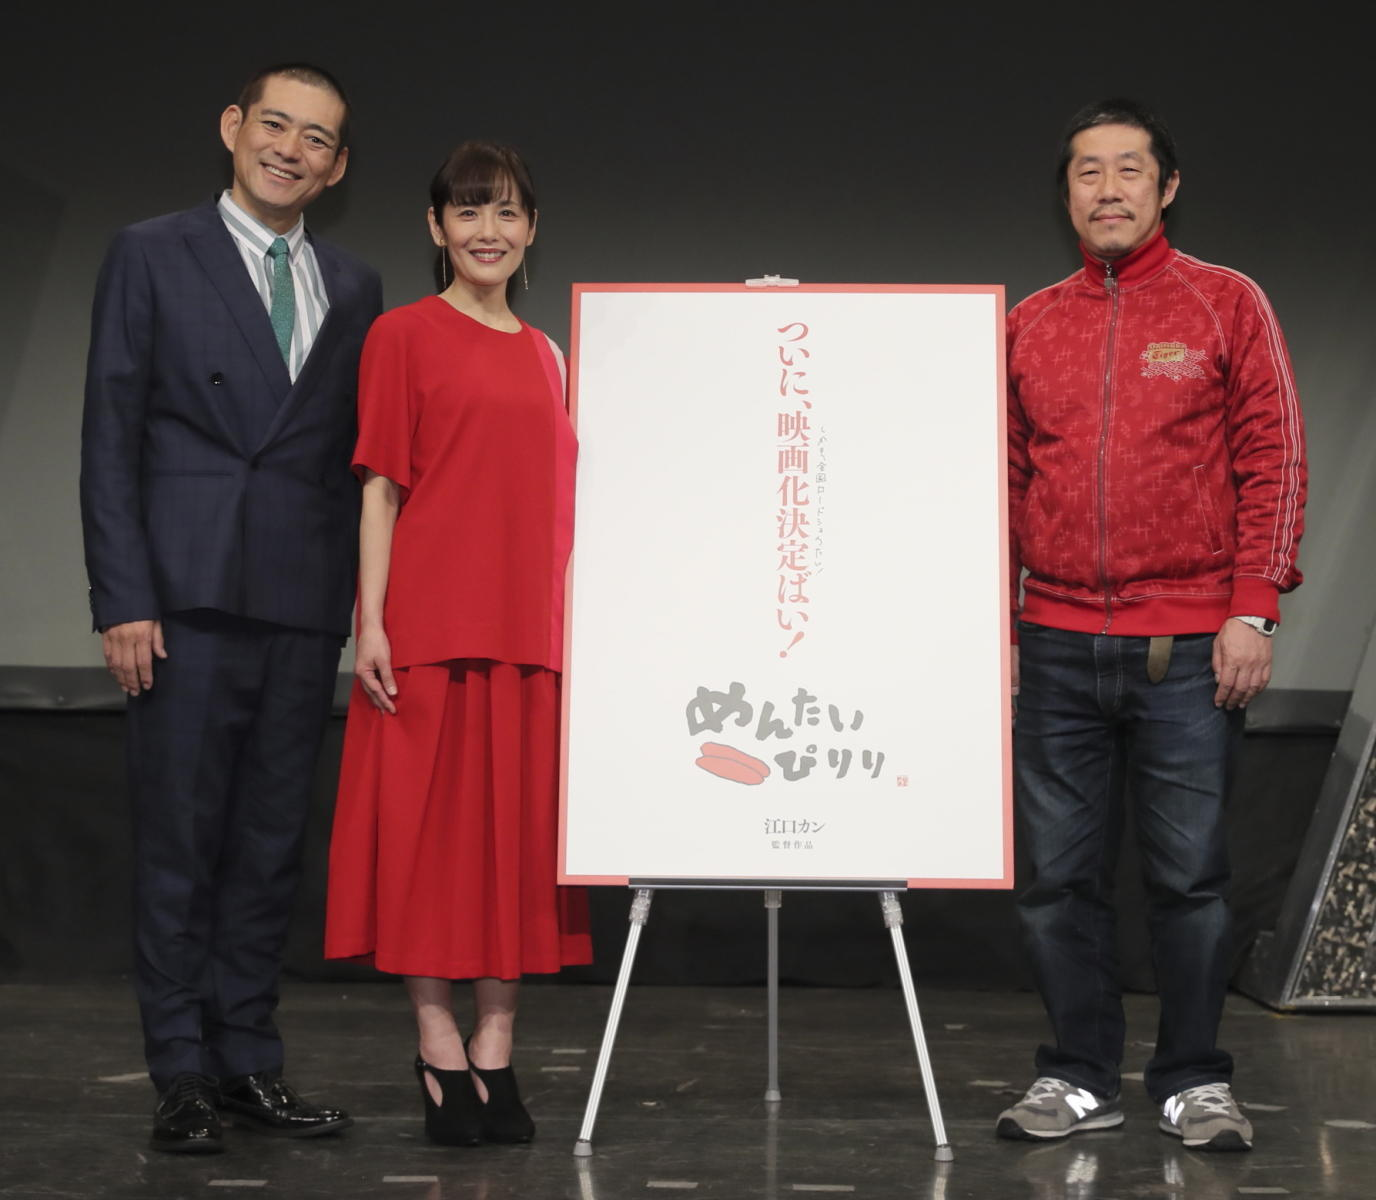 http://news.yoshimoto.co.jp/20180306233928-96b7c480ad3954b491ef283c8904474157121c5c.jpg